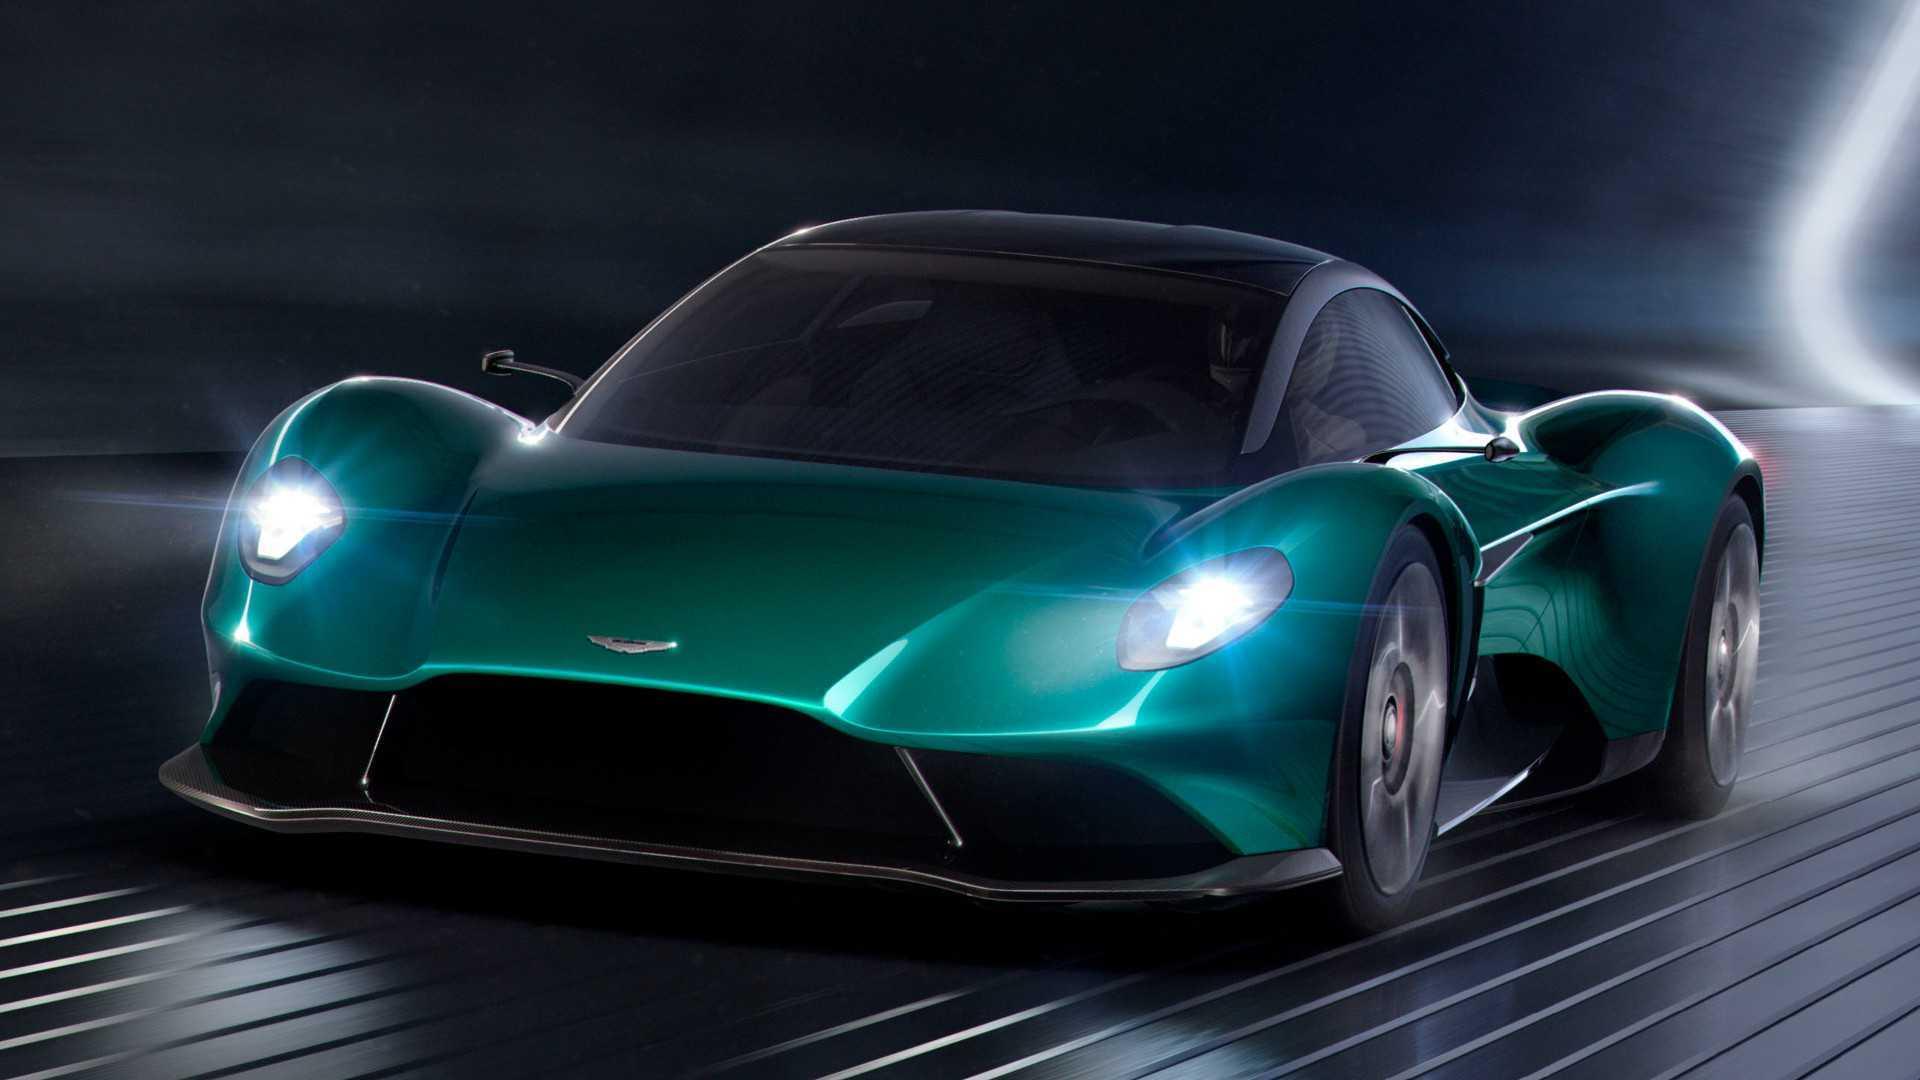 Aston Martin Vanquish Amr Pro And Volante Announced